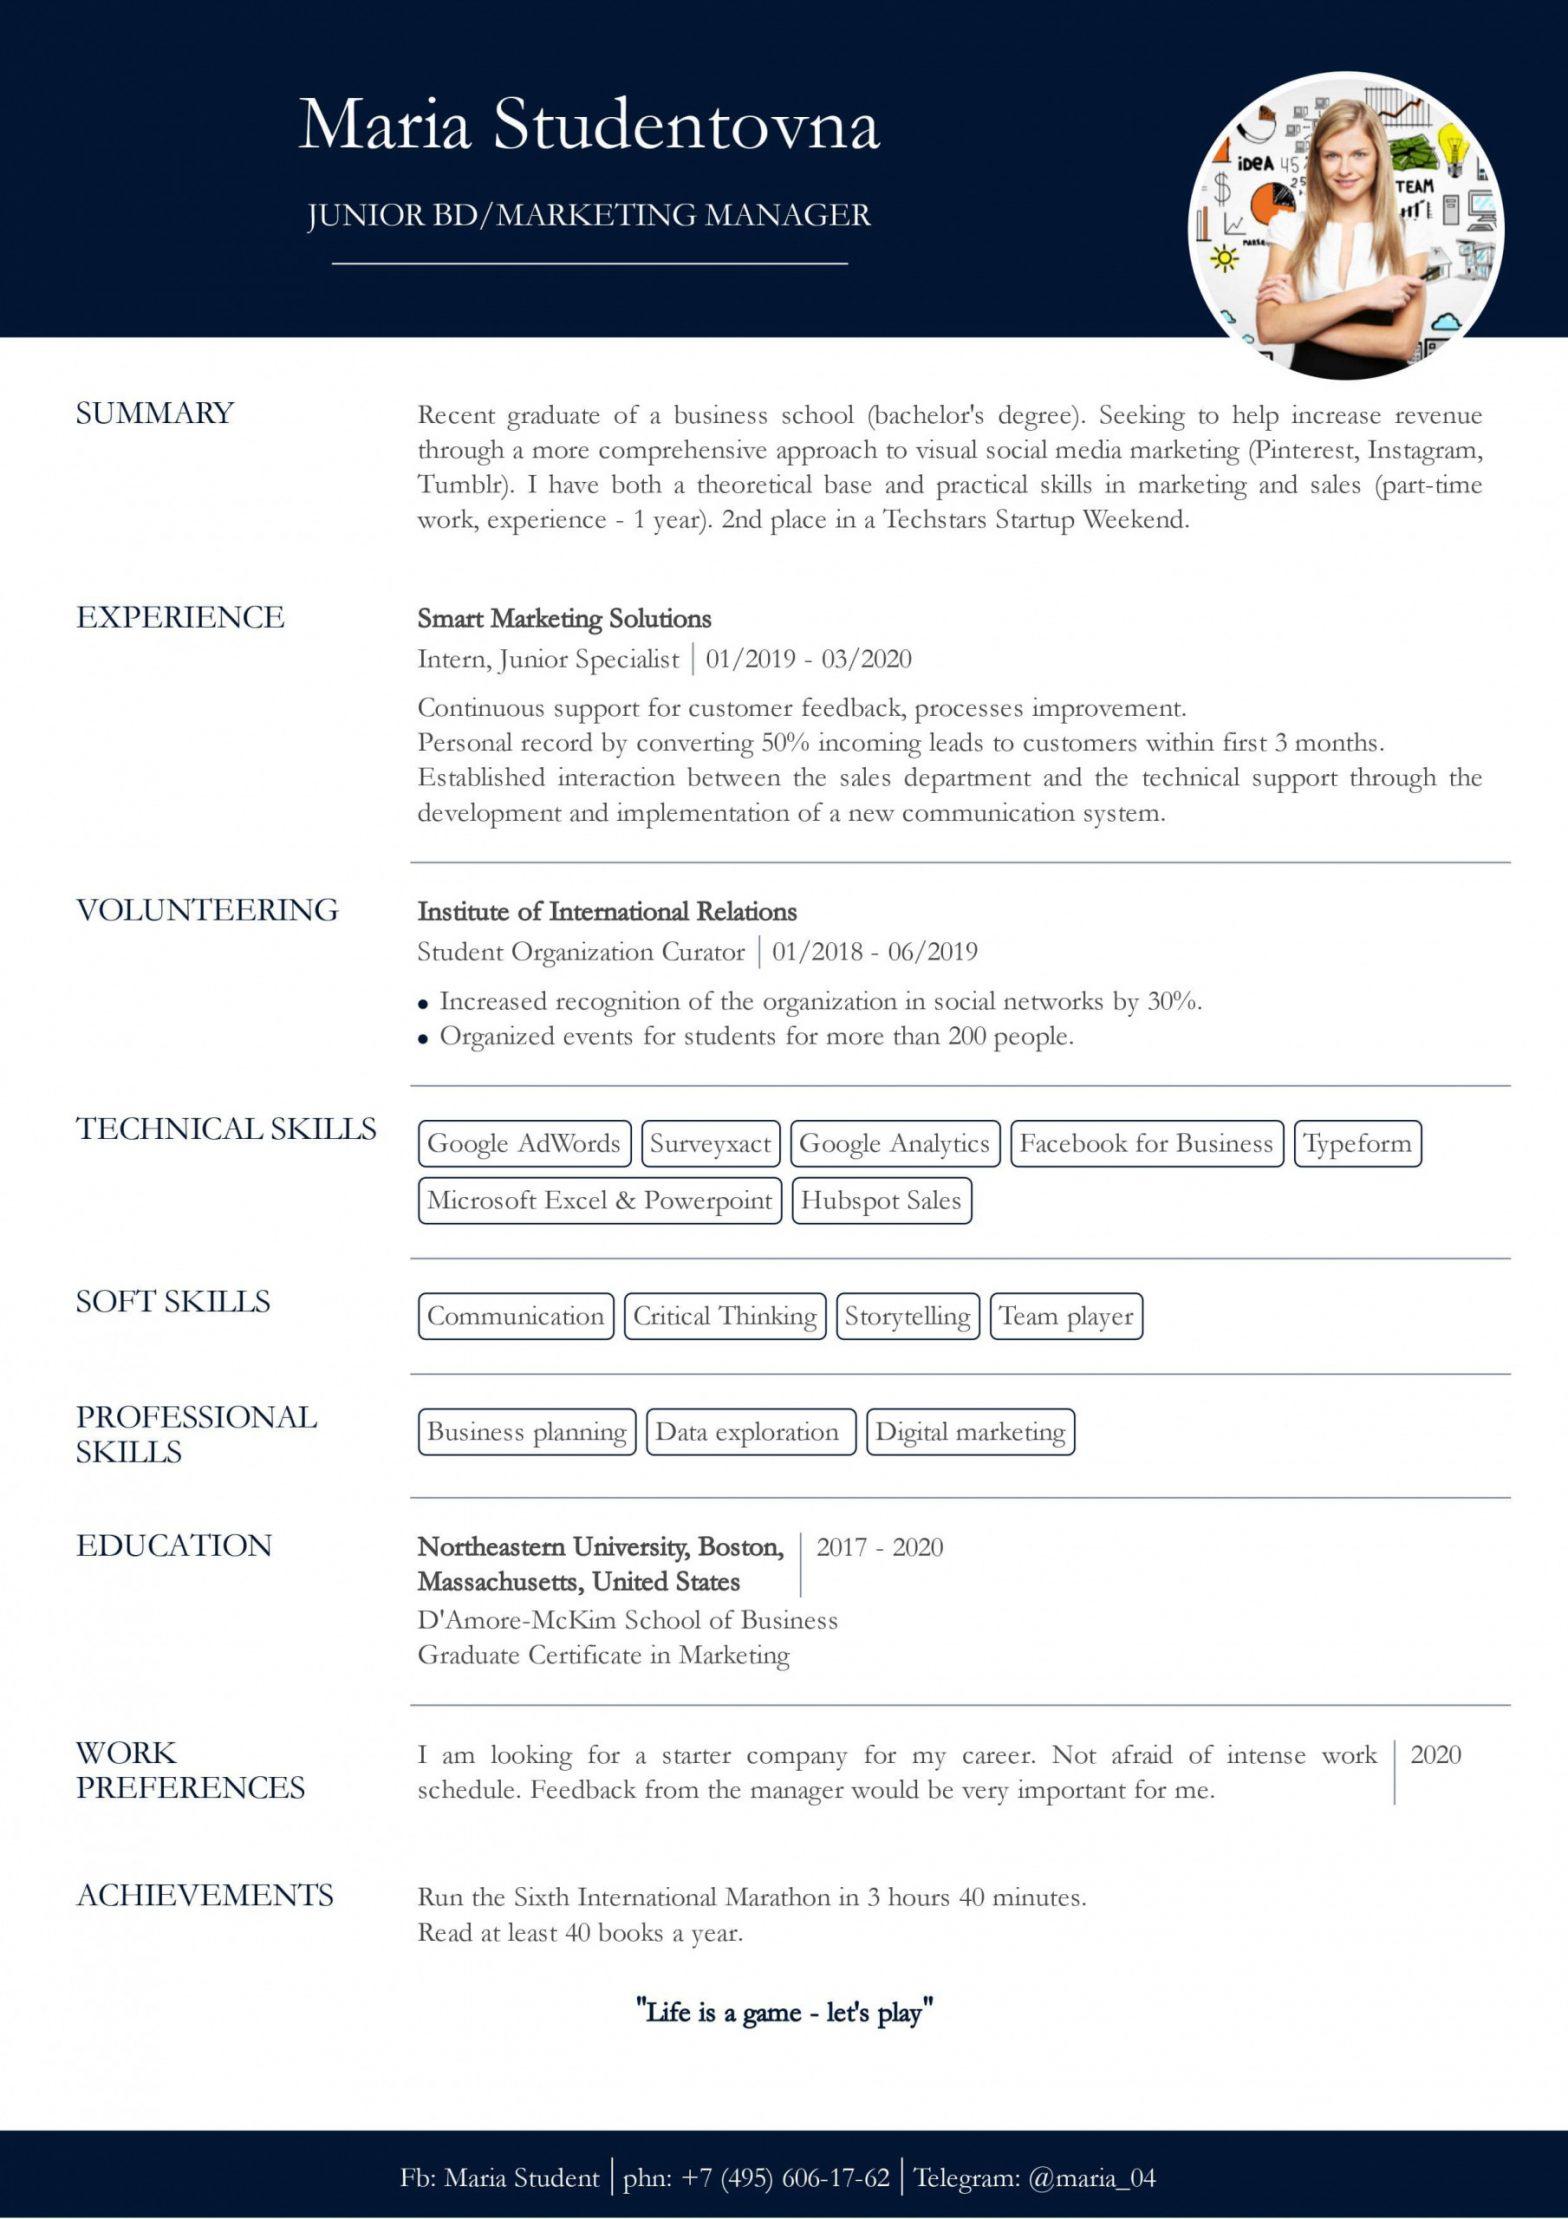 Sample Resume for Internship No Experience Resume with No Work Experience. Sample for Students. - Cv2you Blog